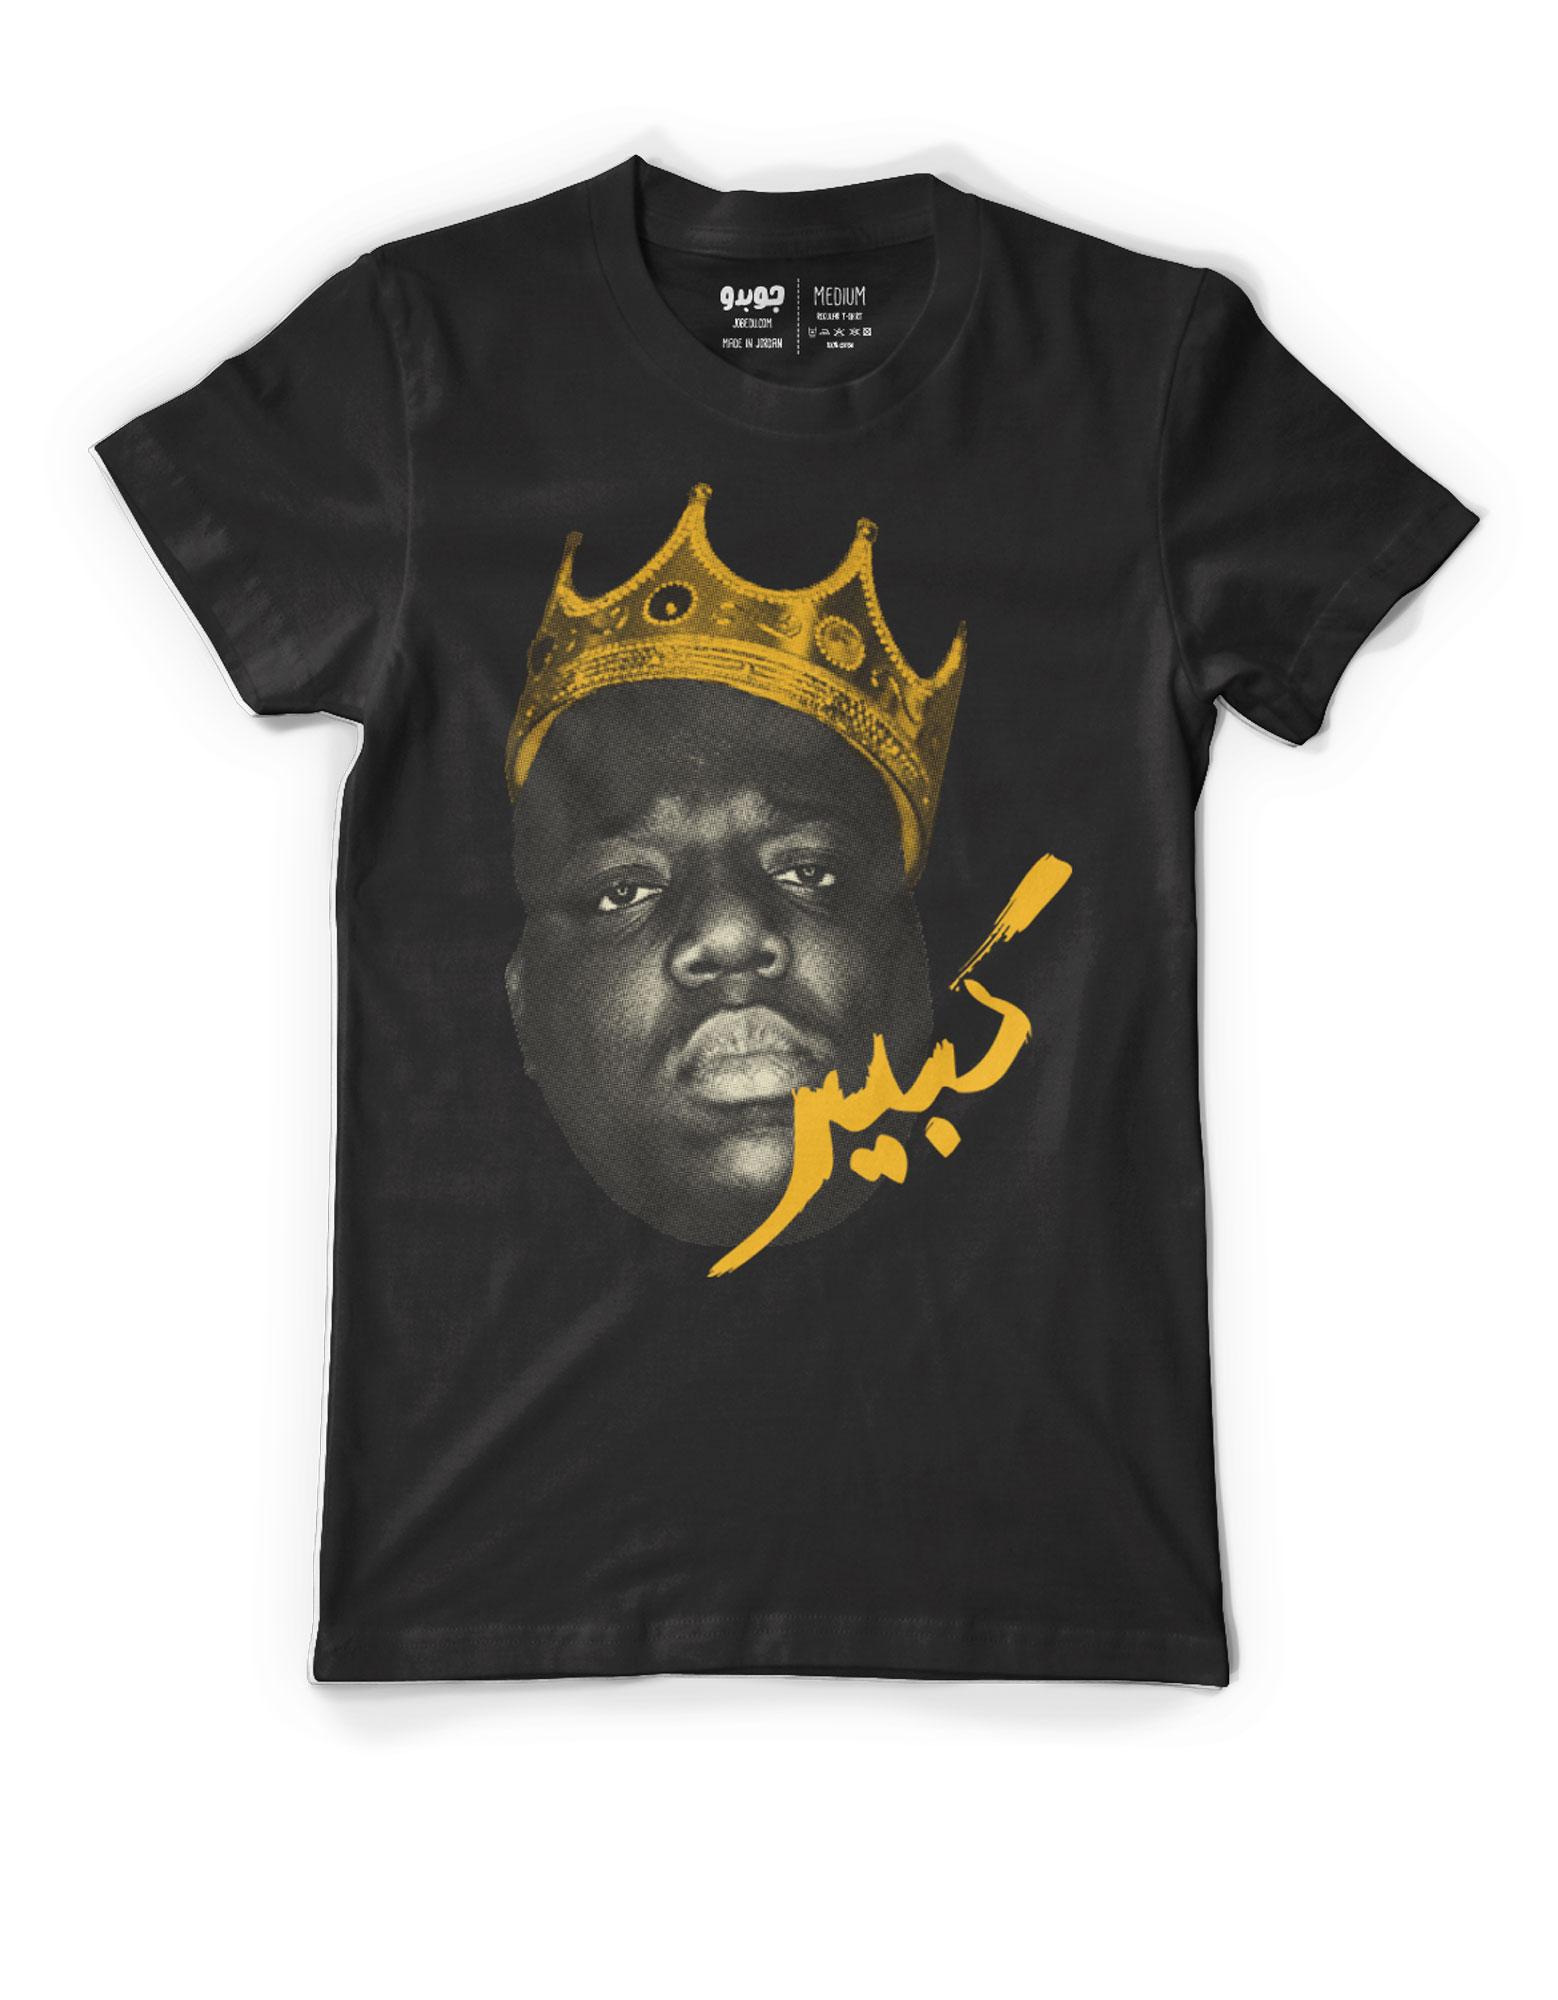 Jo-Bedu Biggie Black Men'S T-Shirt Xl